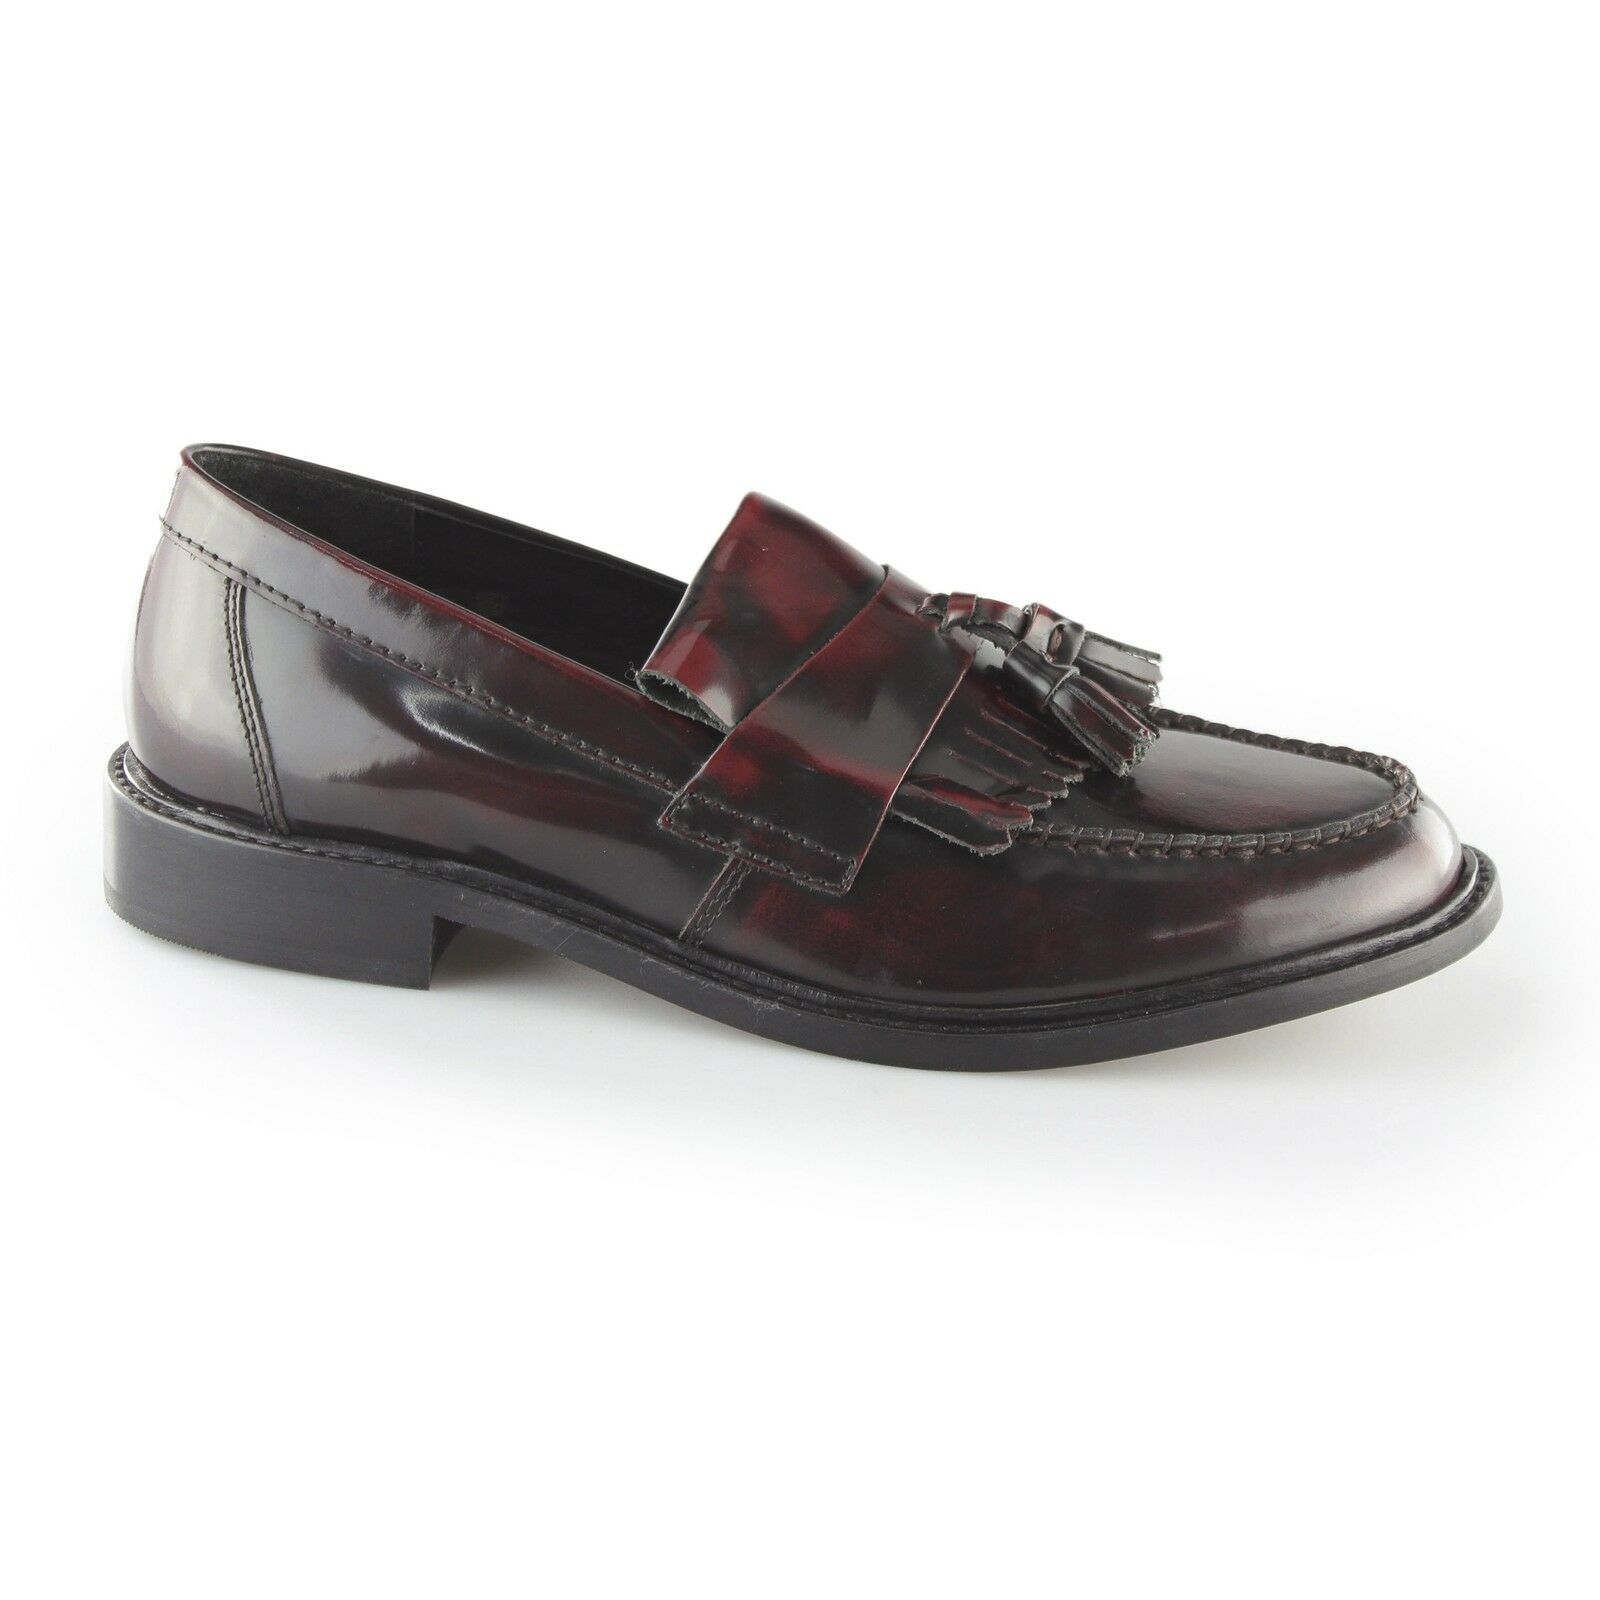 Ikon SELECTA II Mens Polished Leather Tassel Retro 60s MOD Penny Loafers Oxblood